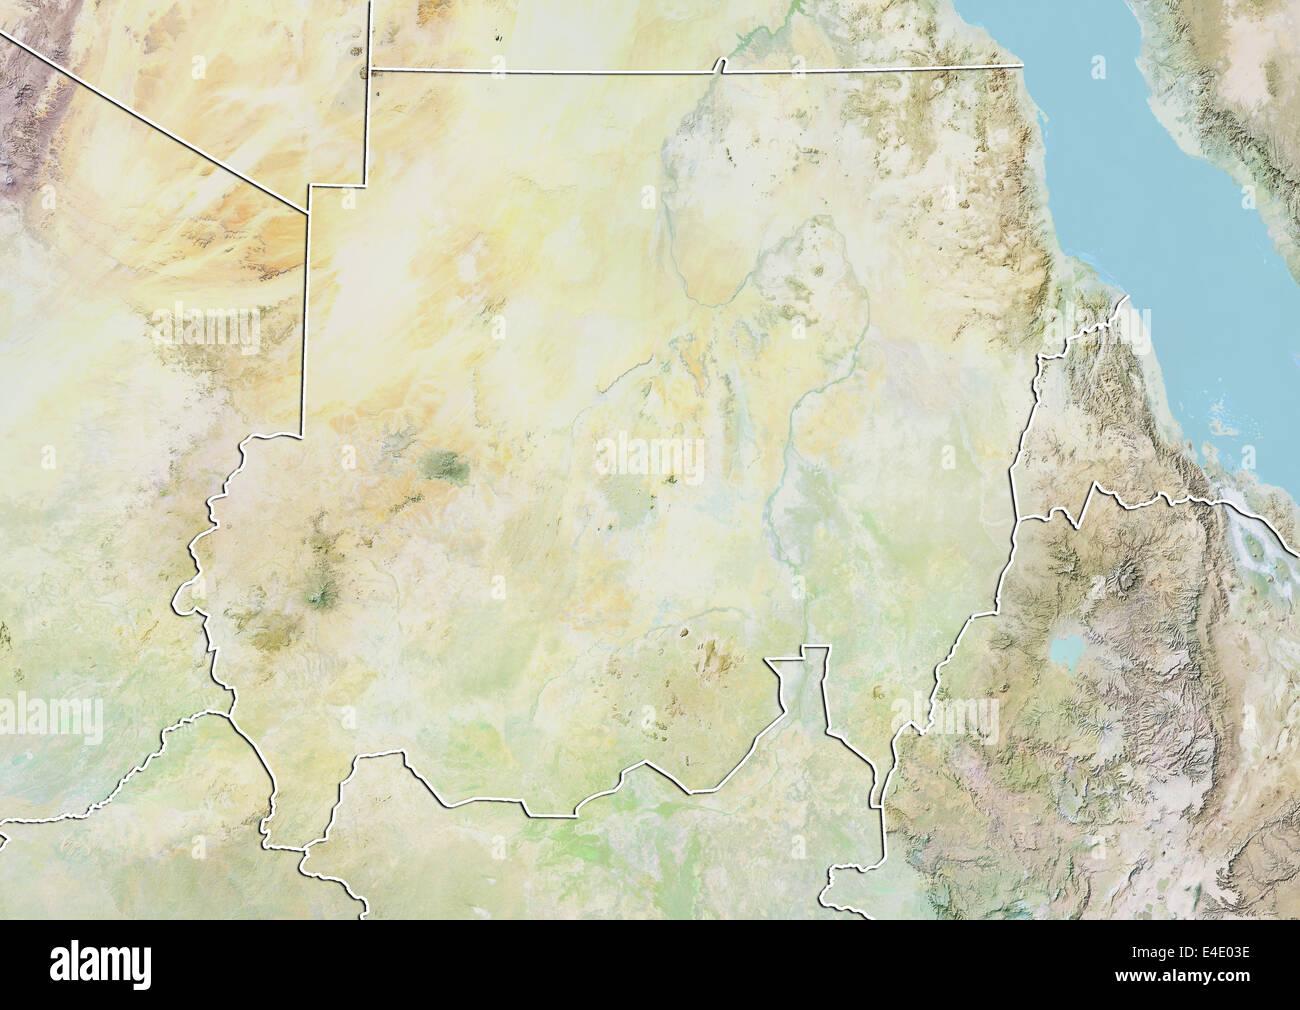 Map Of Darfur Stock Photos & Map Of Darfur Stock Images - Alamy Darfur Sudan Map on darfur world map, afghanistan map, darfur genocide, darfur today, darfur sudan country, darfur sudan flag, darfur village, darfur tribes, south sudan, china texas map, equality alabama map, darfur on map, darfur africa map, darfur people, darfur war, darfur google, victoria falls africa map, el fasher darfur map, darfur sudan food, darfur rebels, iran map,